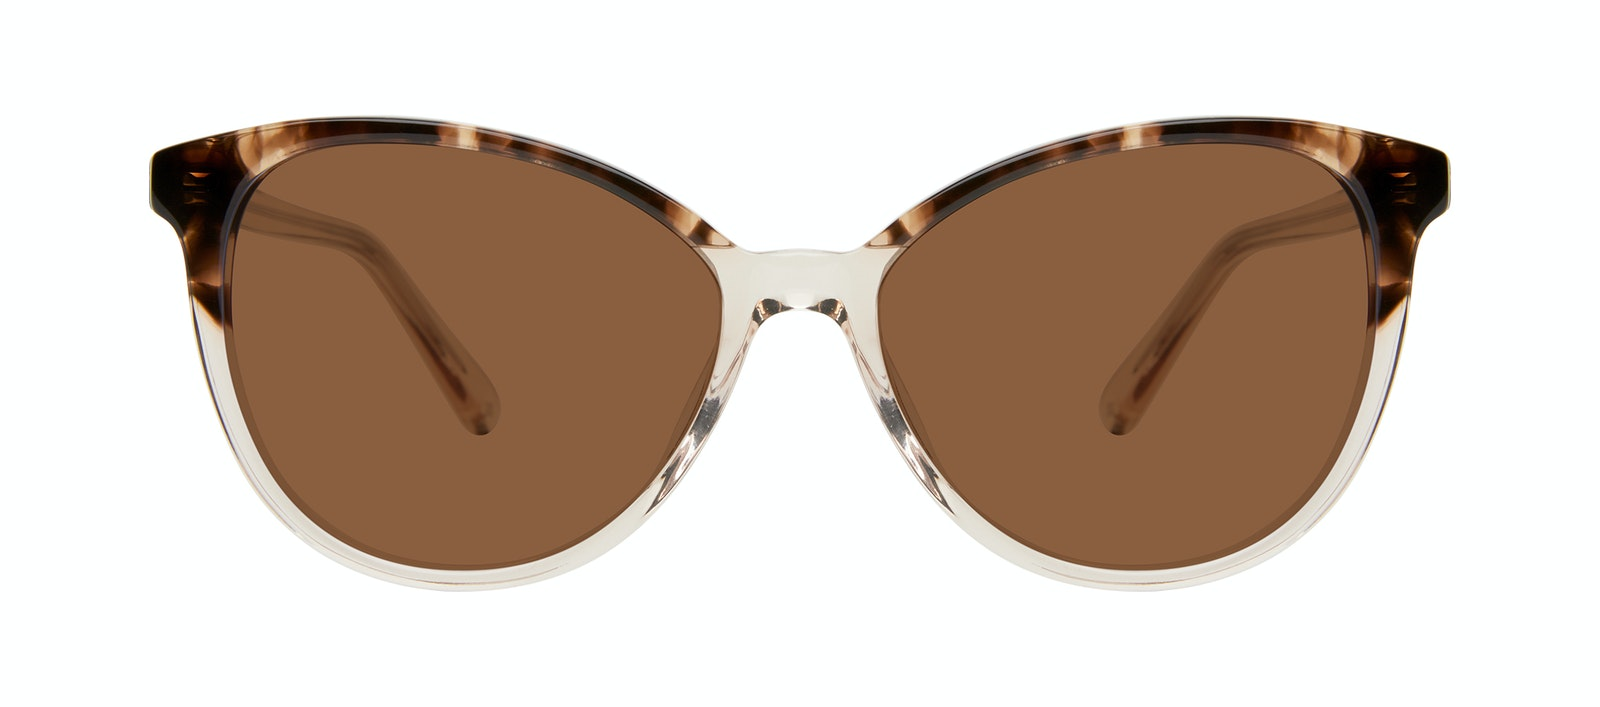 Affordable Fashion Glasses Cat Eye Sunglasses Women Esprit Golden Tortoise Front